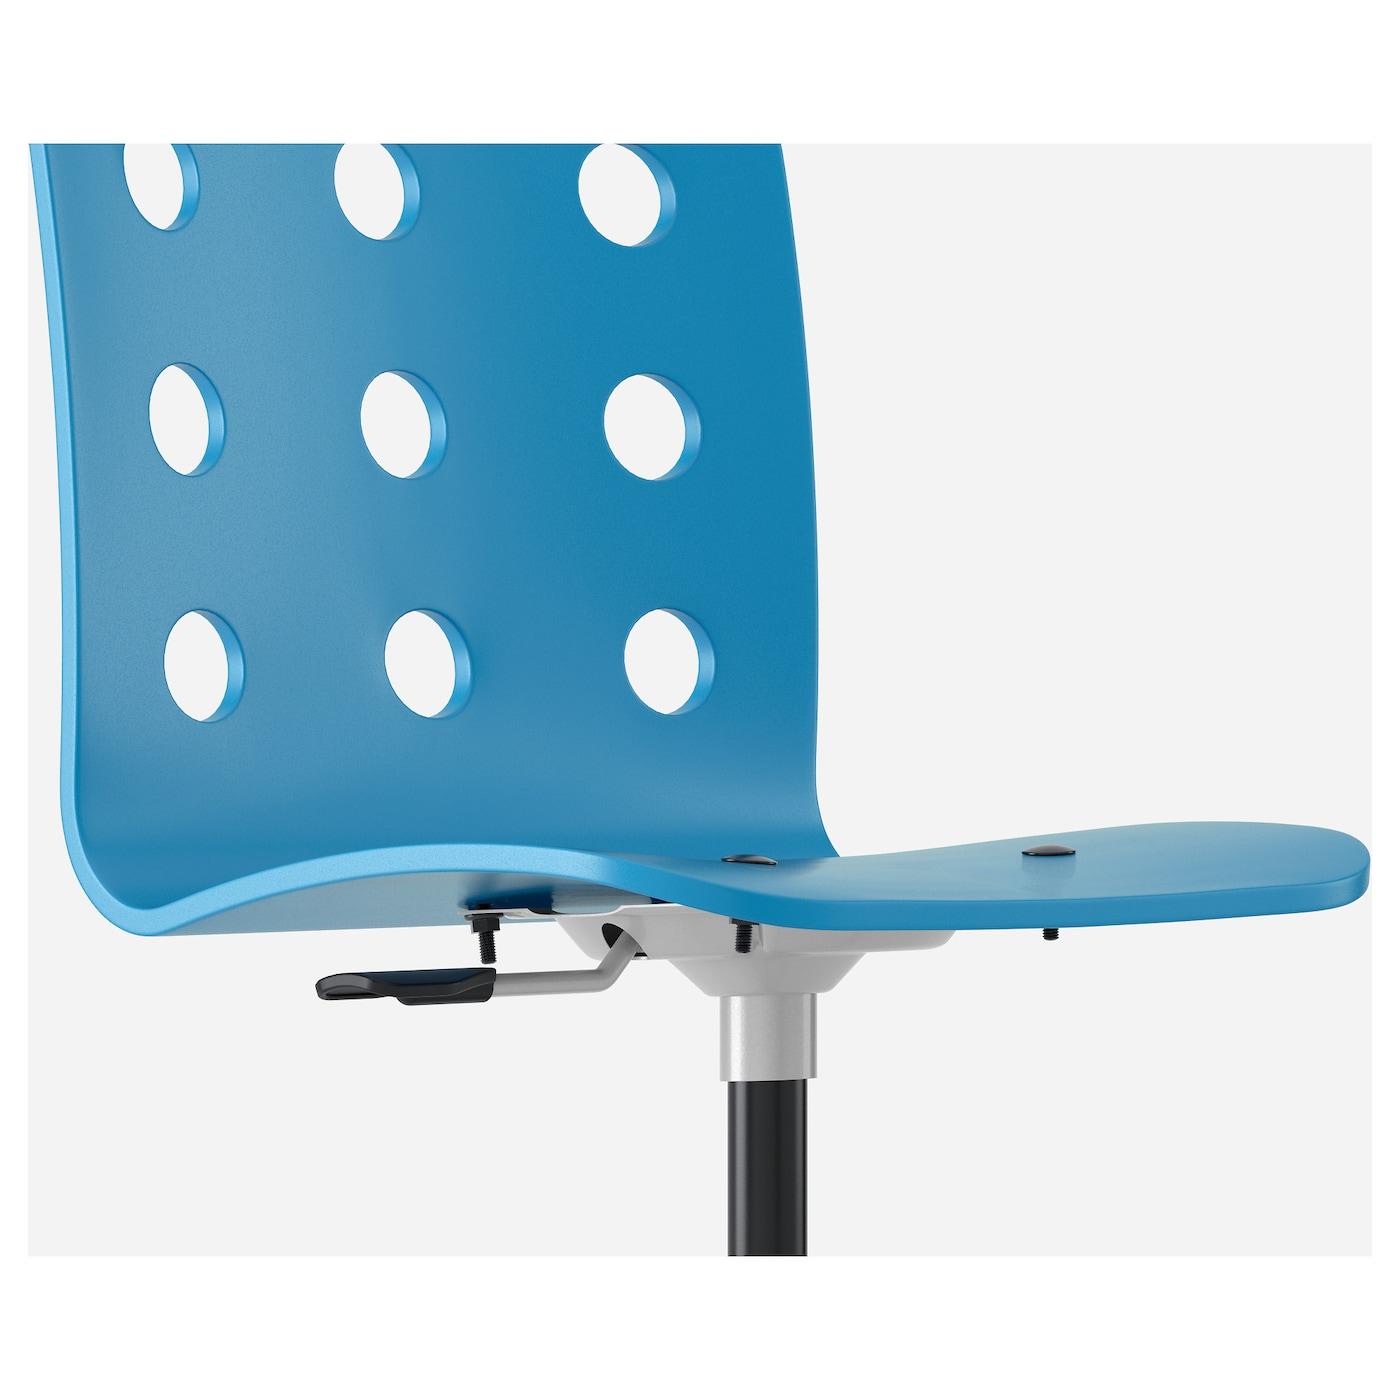 jules children 39 s desk chair blue silver colour ikea. Black Bedroom Furniture Sets. Home Design Ideas